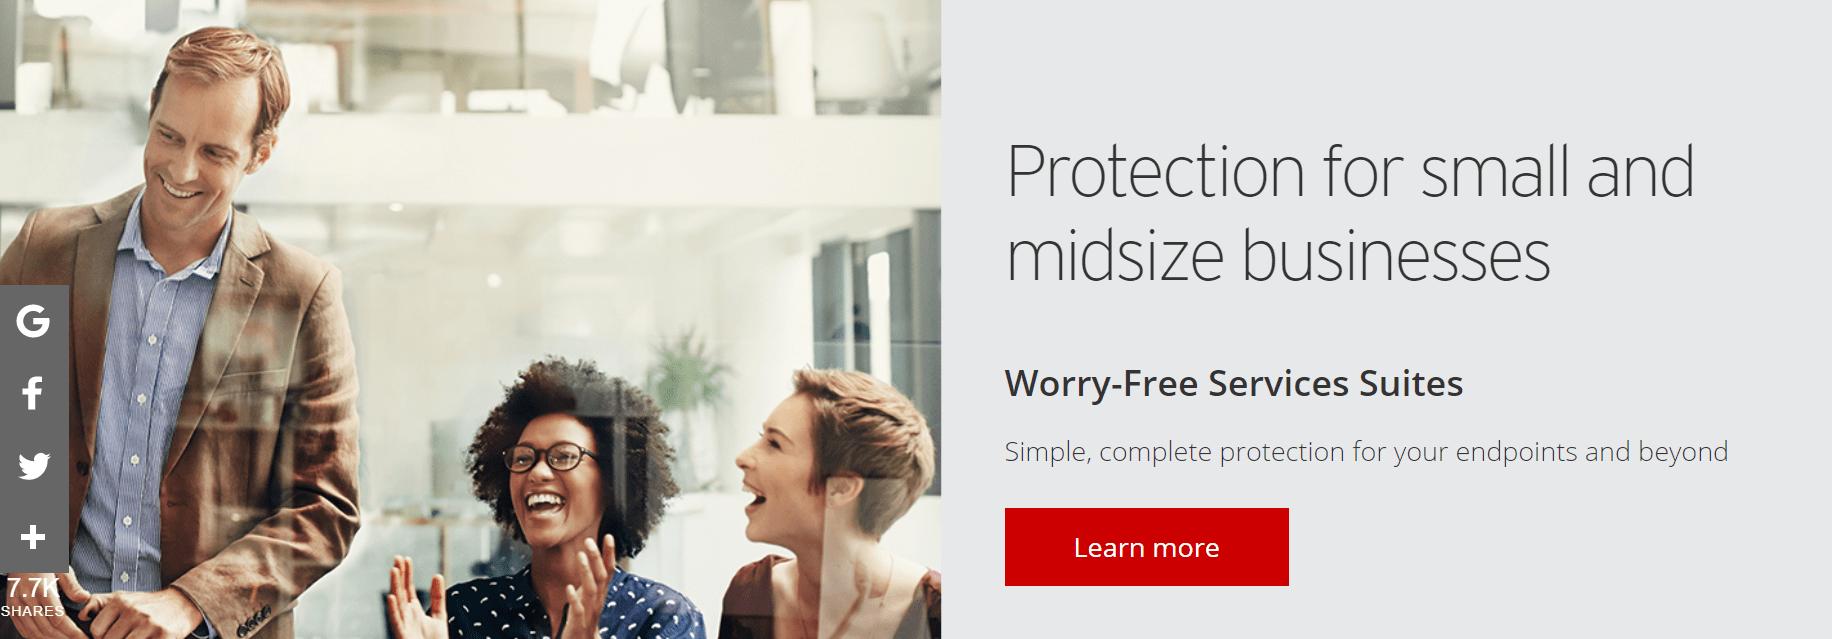 Trend Micro Antivirus coupon- protection